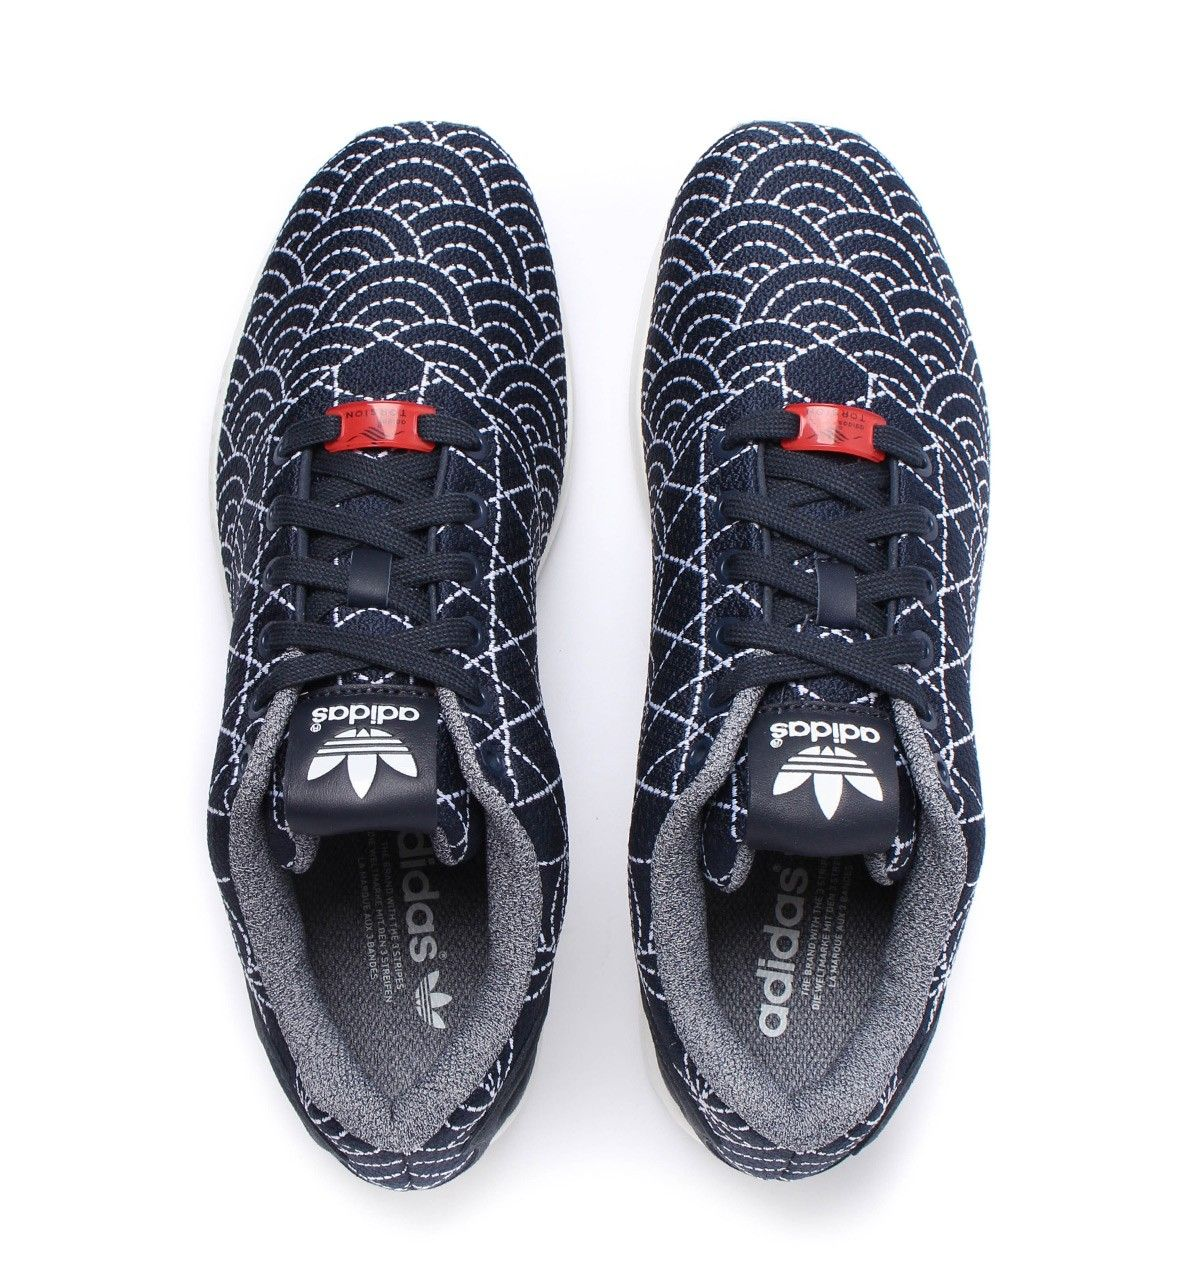 sports shoes 7bbc0 d34dc Adidas Originals ZX Flux Navy Patterned Knit Trainers ...